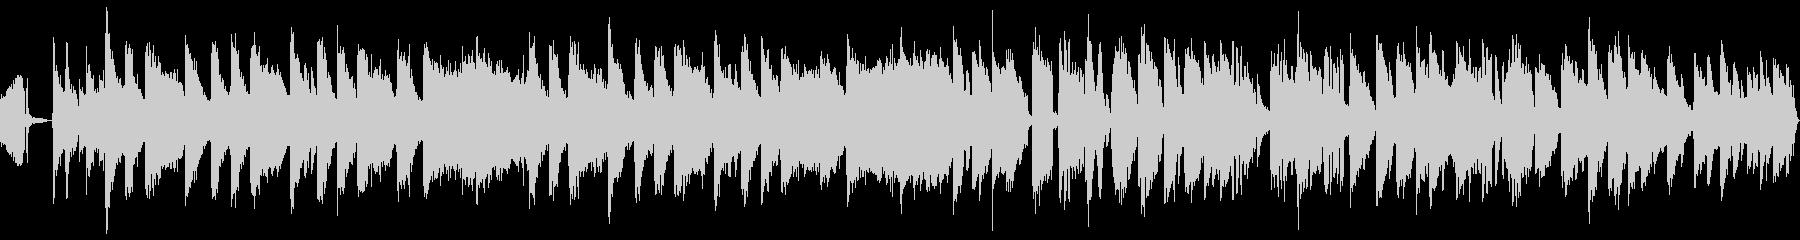 EDM、勢いある明るめスタイリッシュCMの未再生の波形